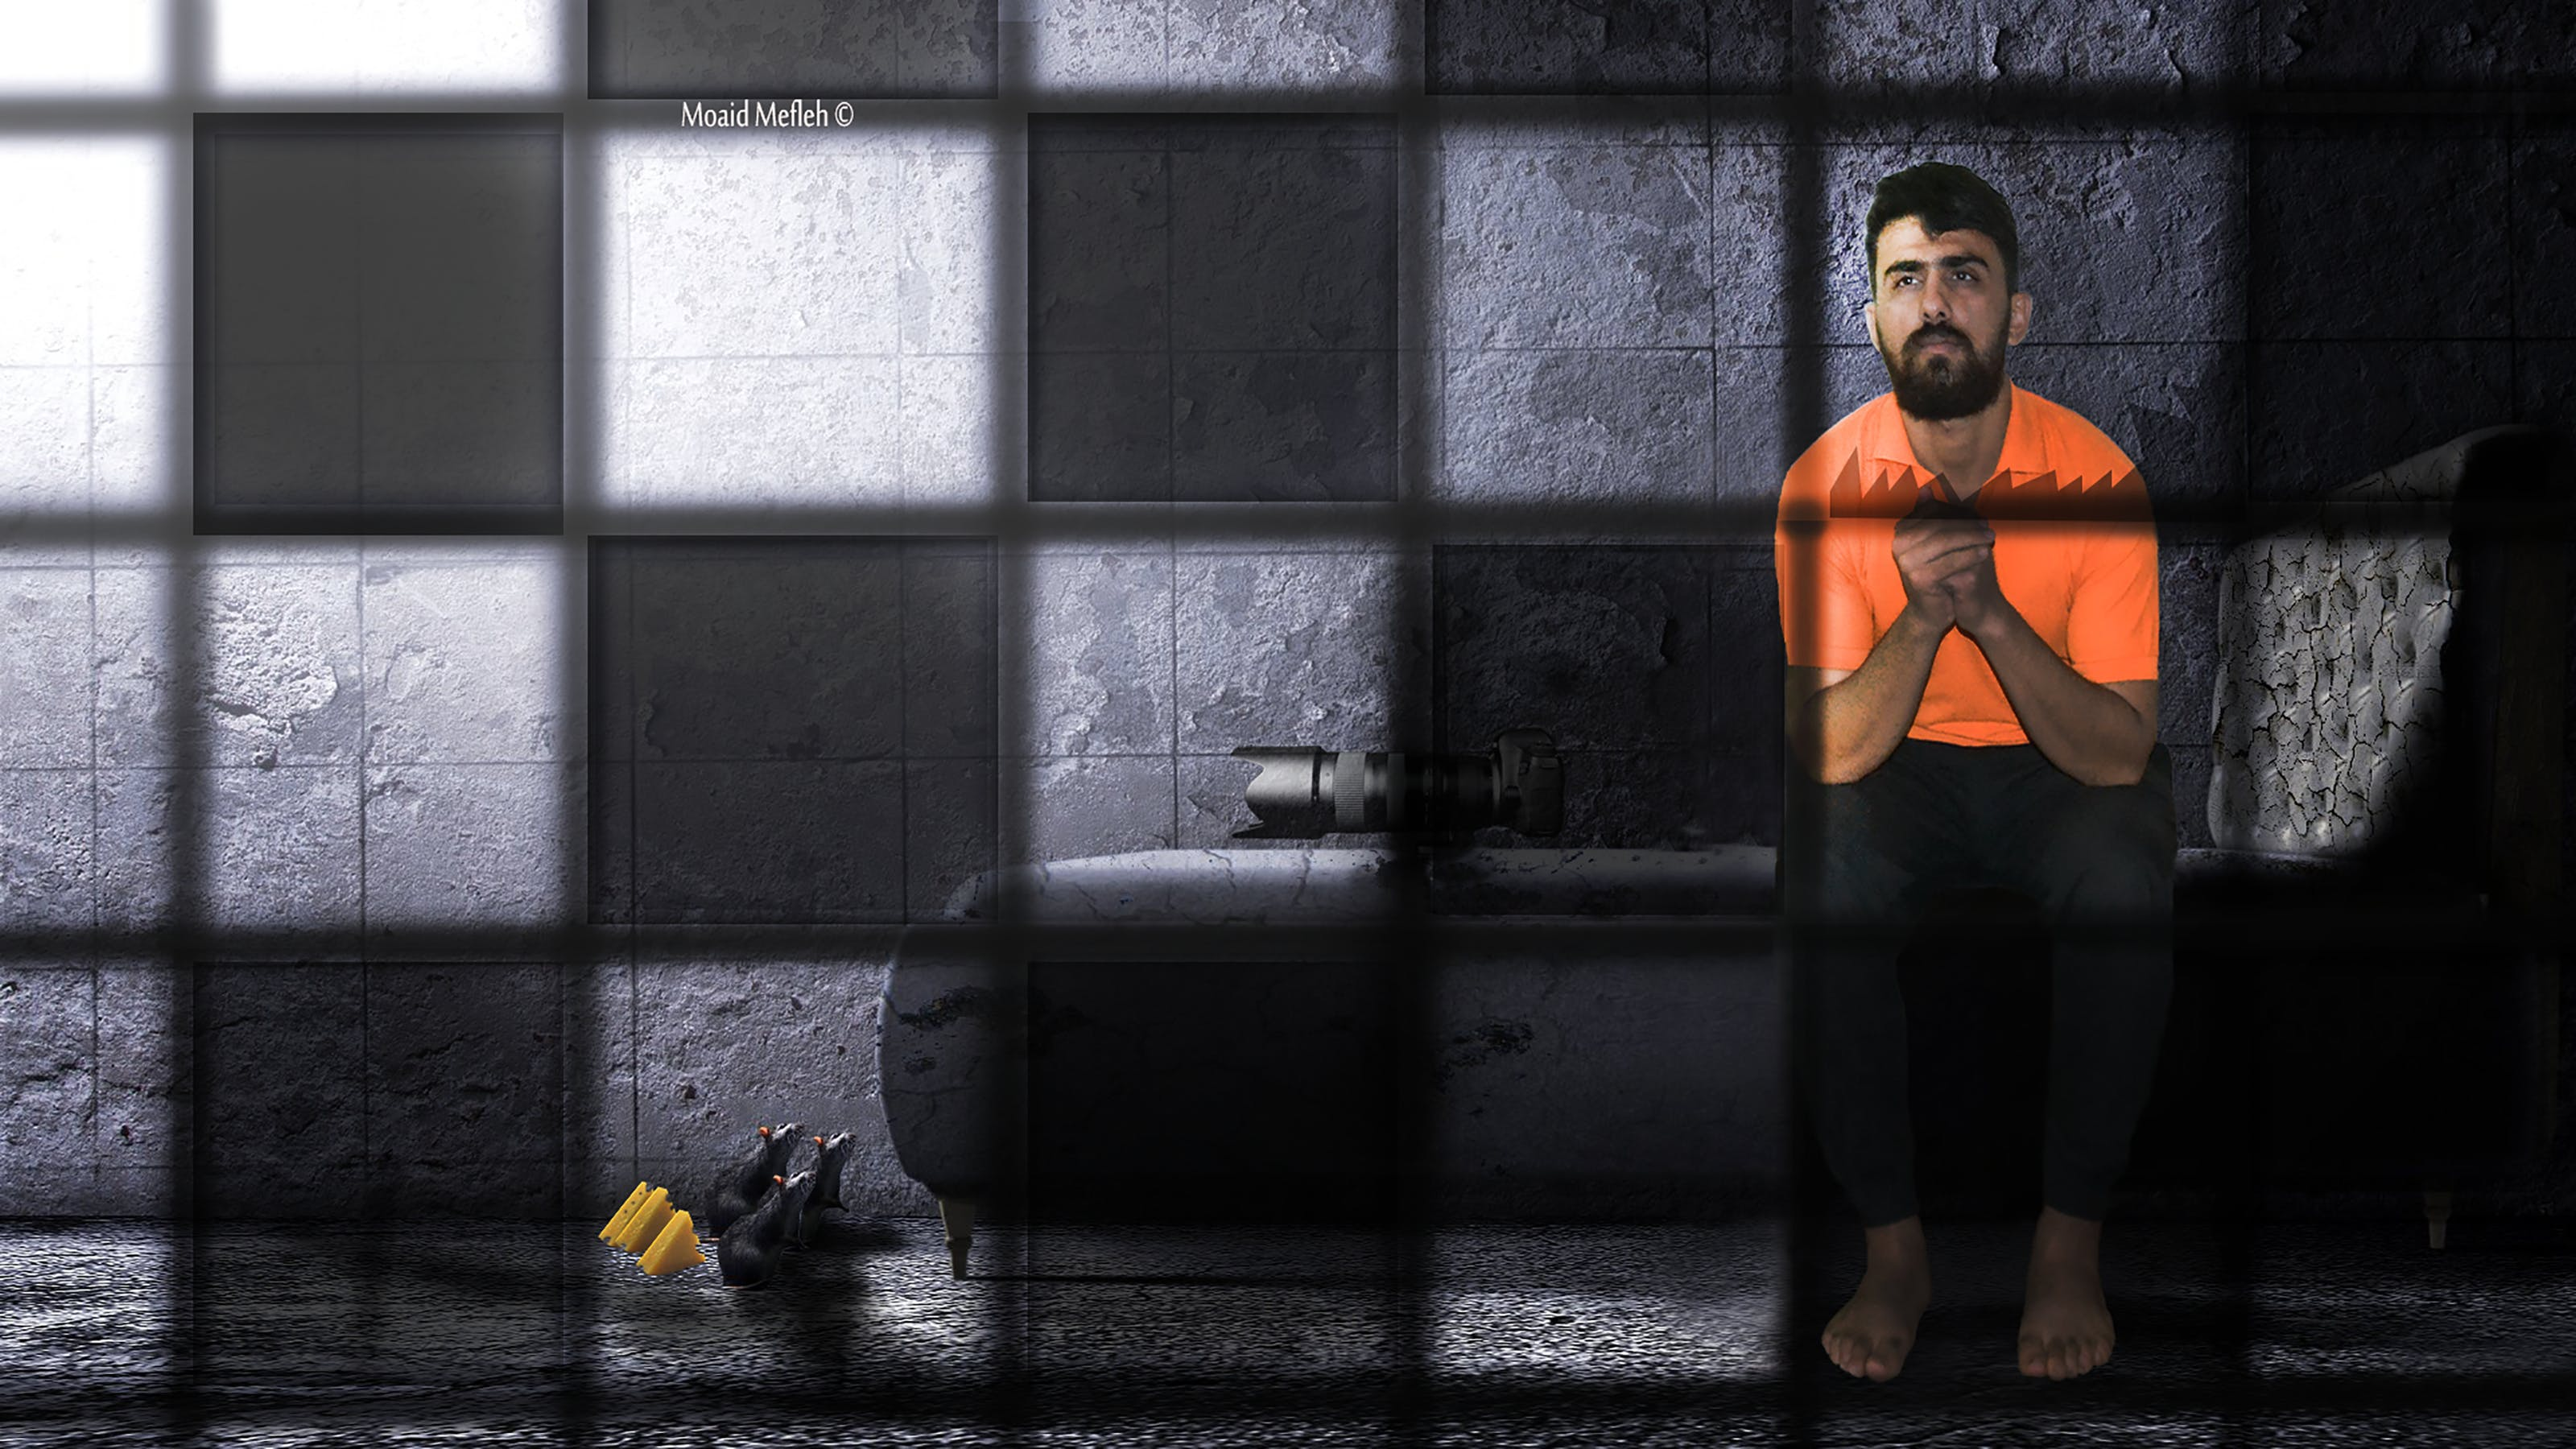 Immagine gratuita di moaid mefleh, photoshop